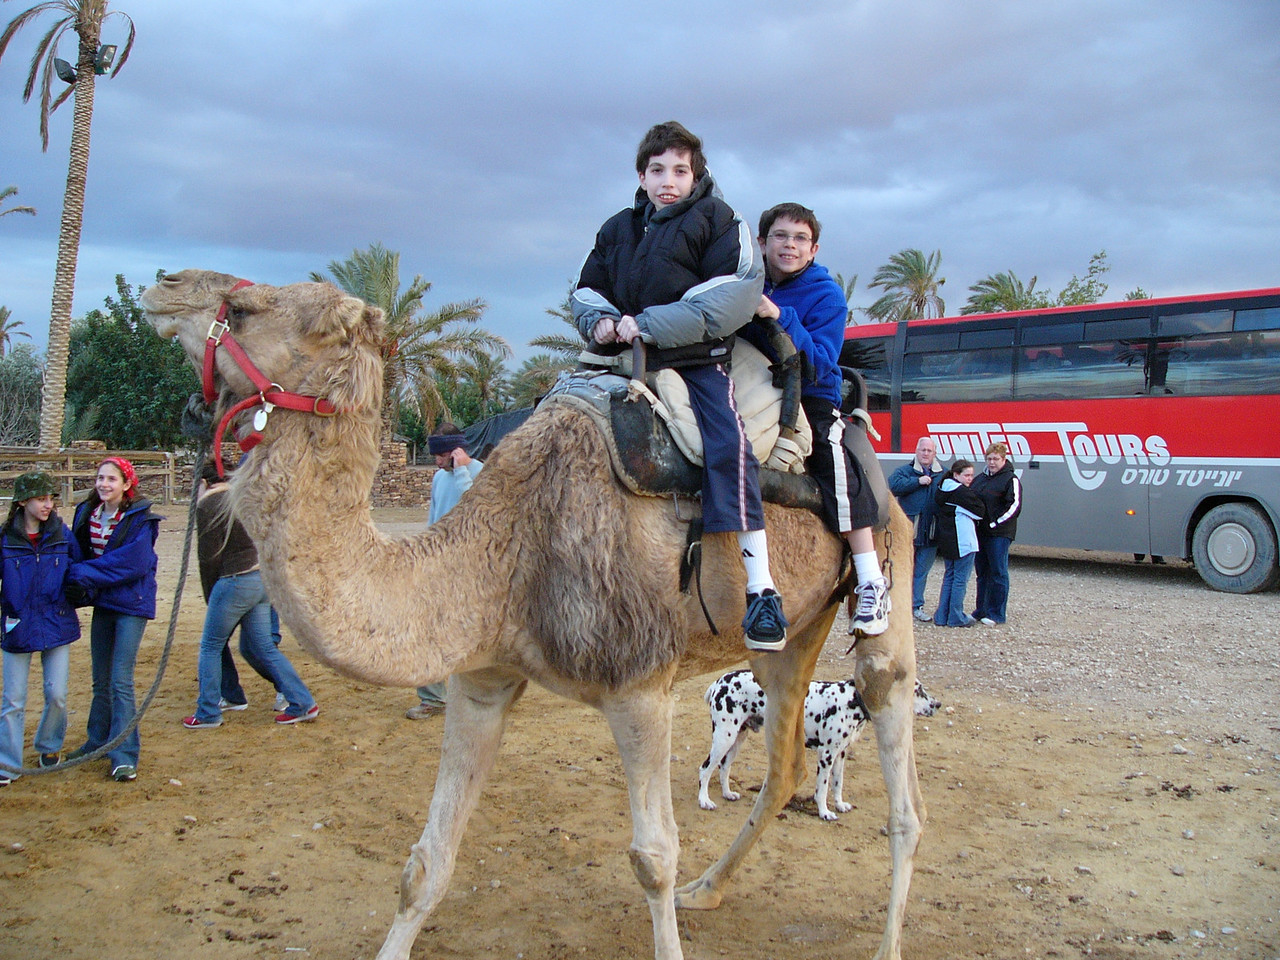 JandC on Camel